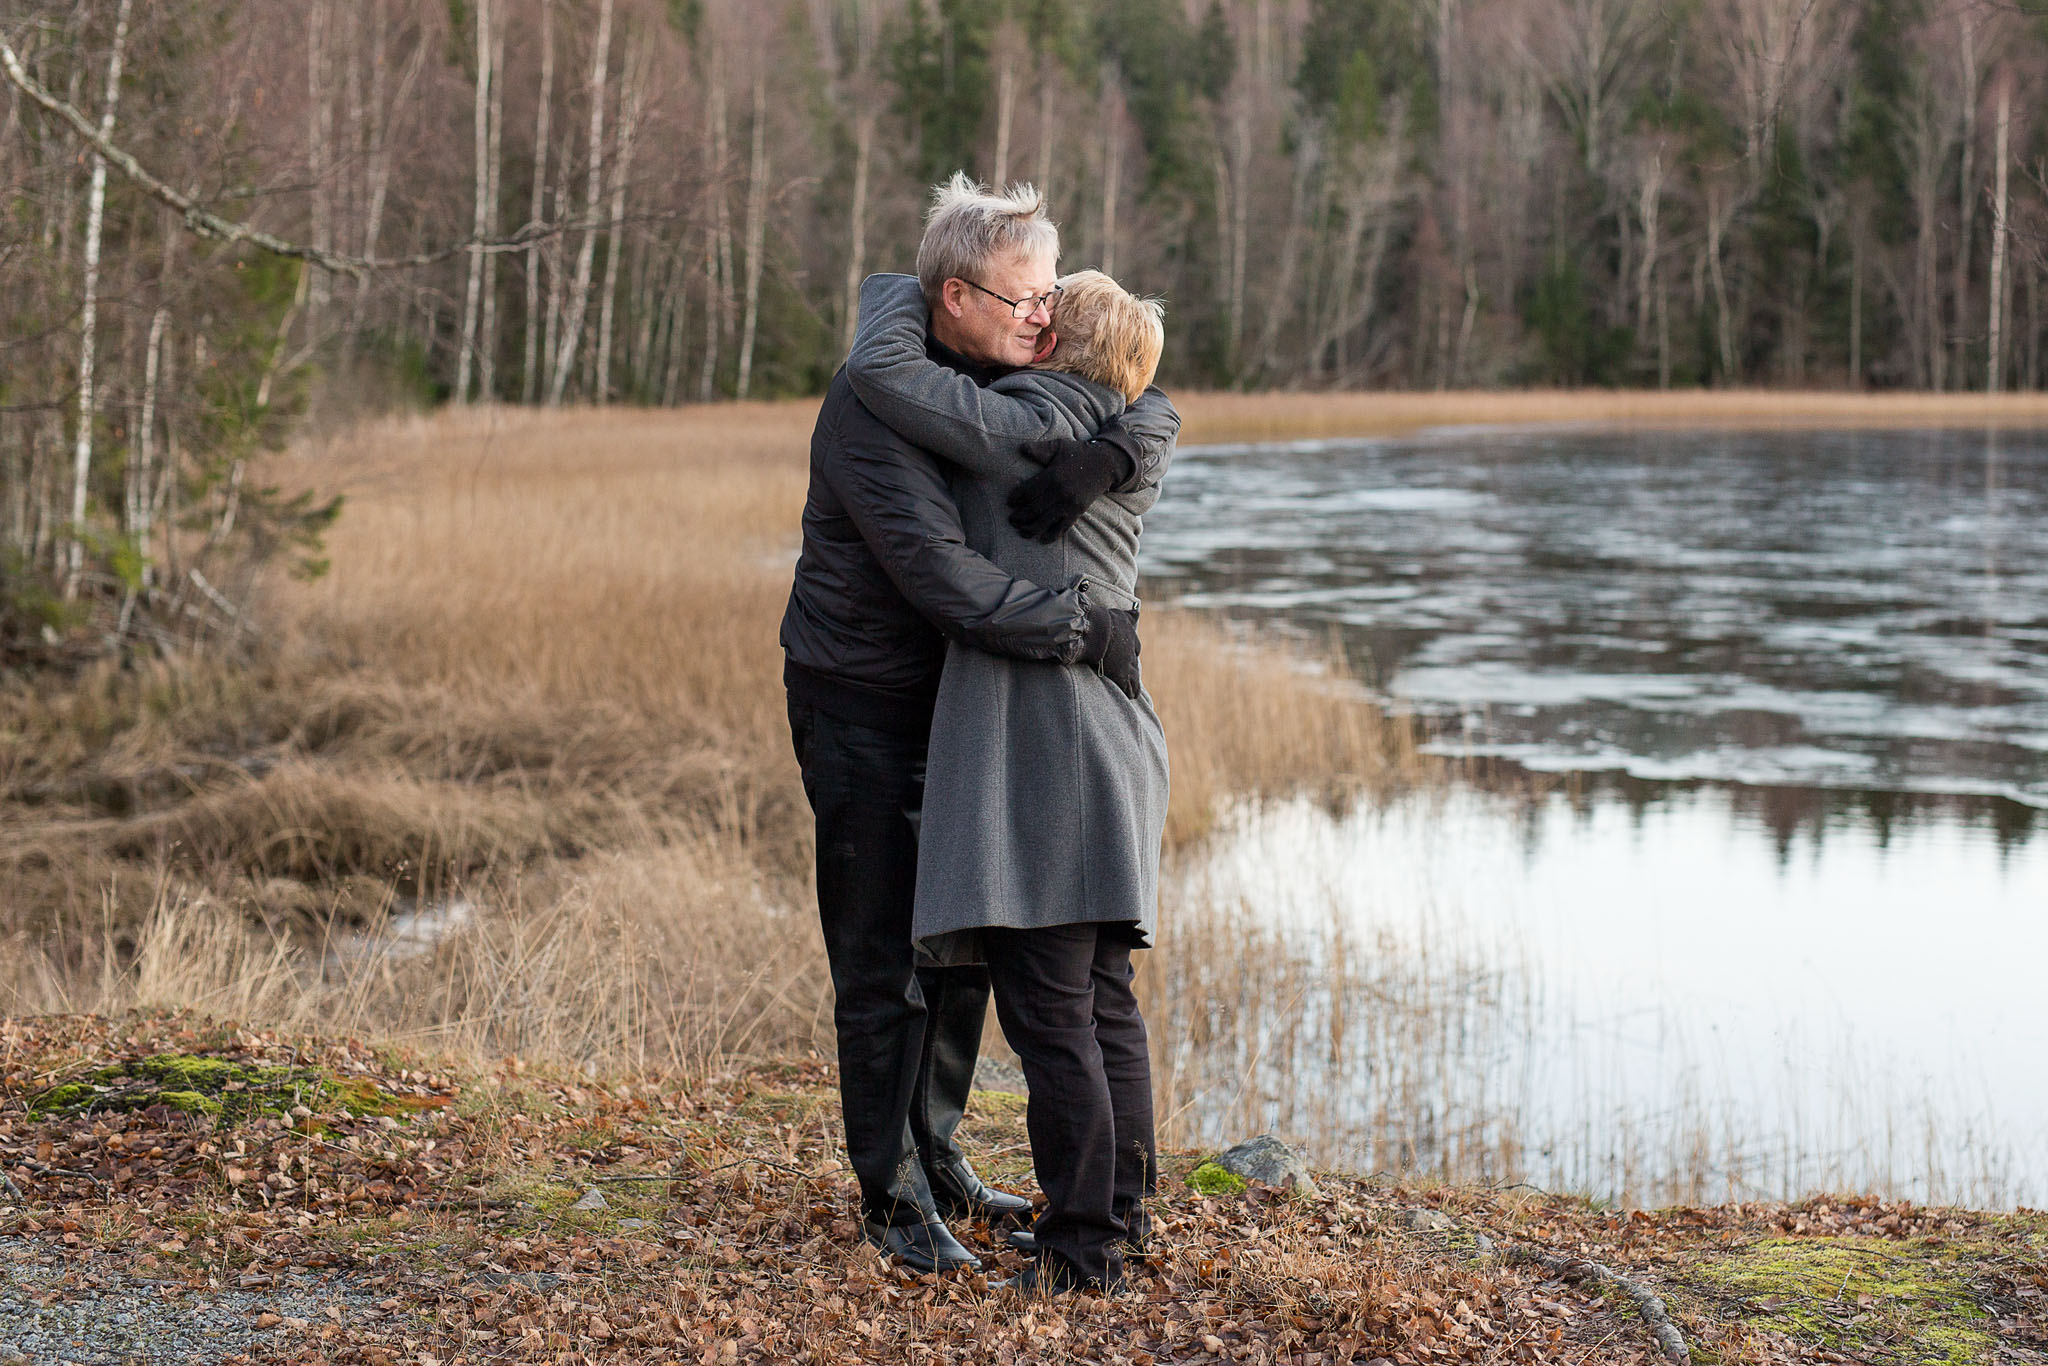 Madeleine Hedin, Mrttjrnsvgen 17, Hudiksvall | patient-survey.net